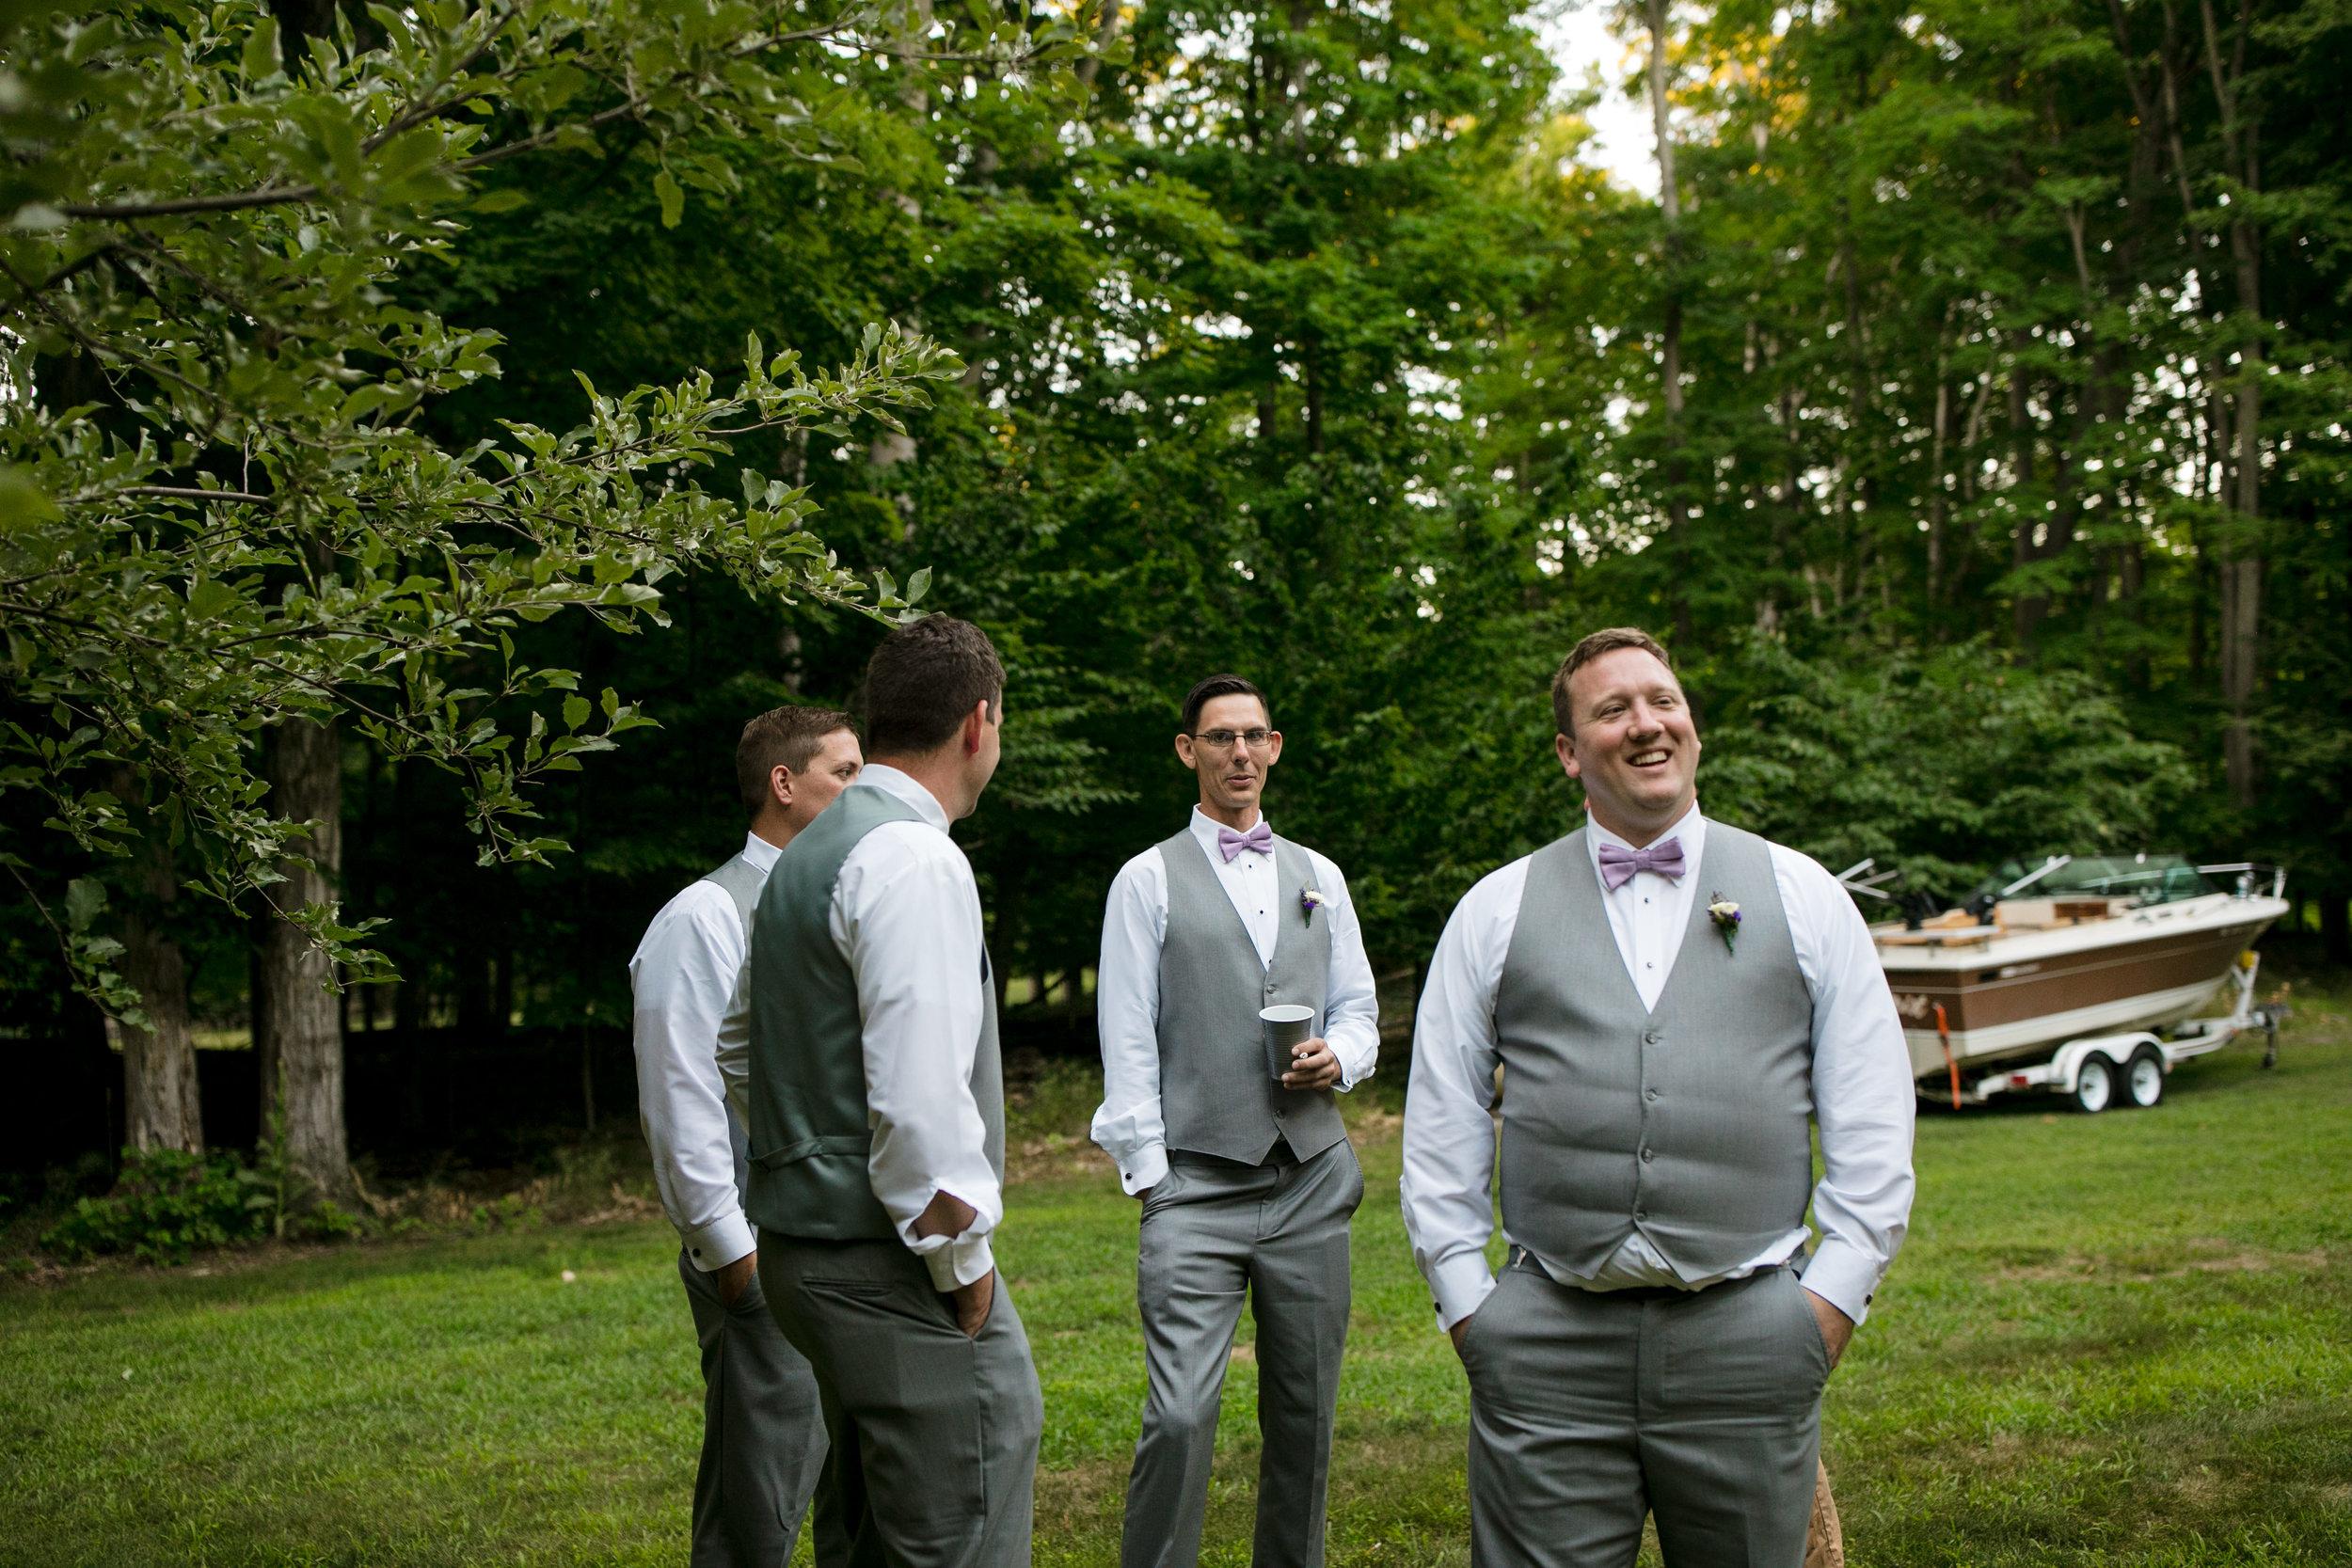 ludington-michigan-intimate-backyard-wedding-jessica-nolan484.jpg